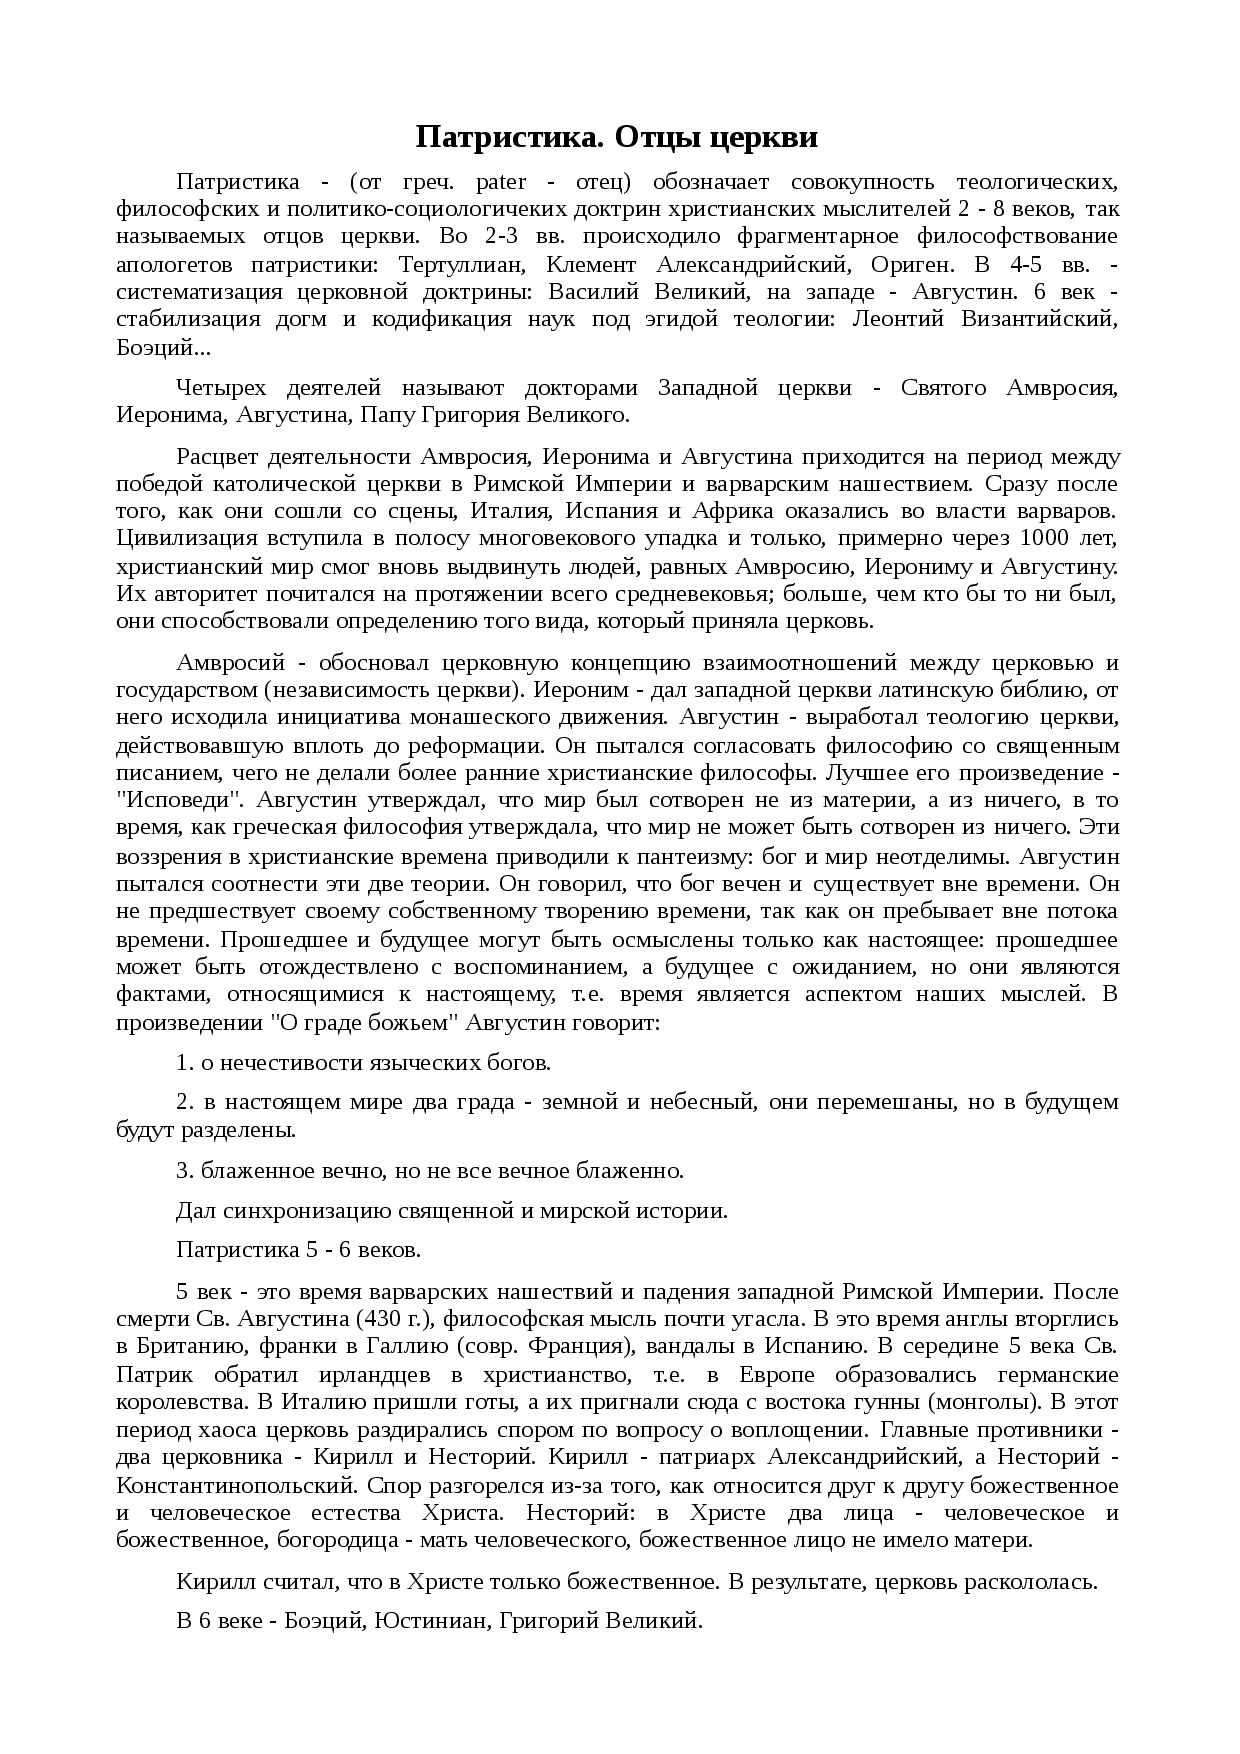 Особенности патристики